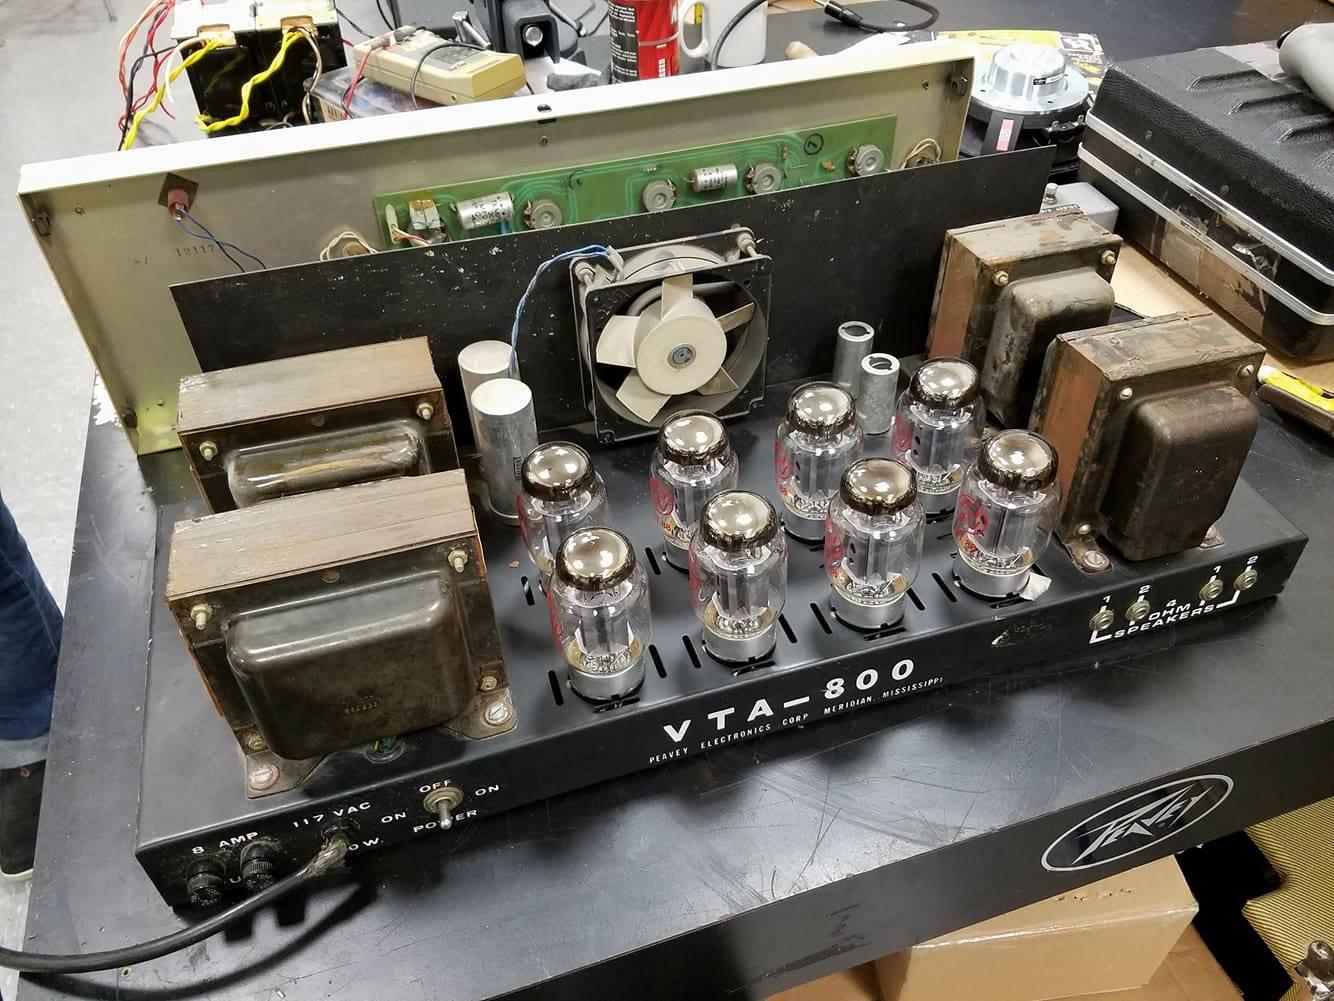 Peavey VTA-800 Inside